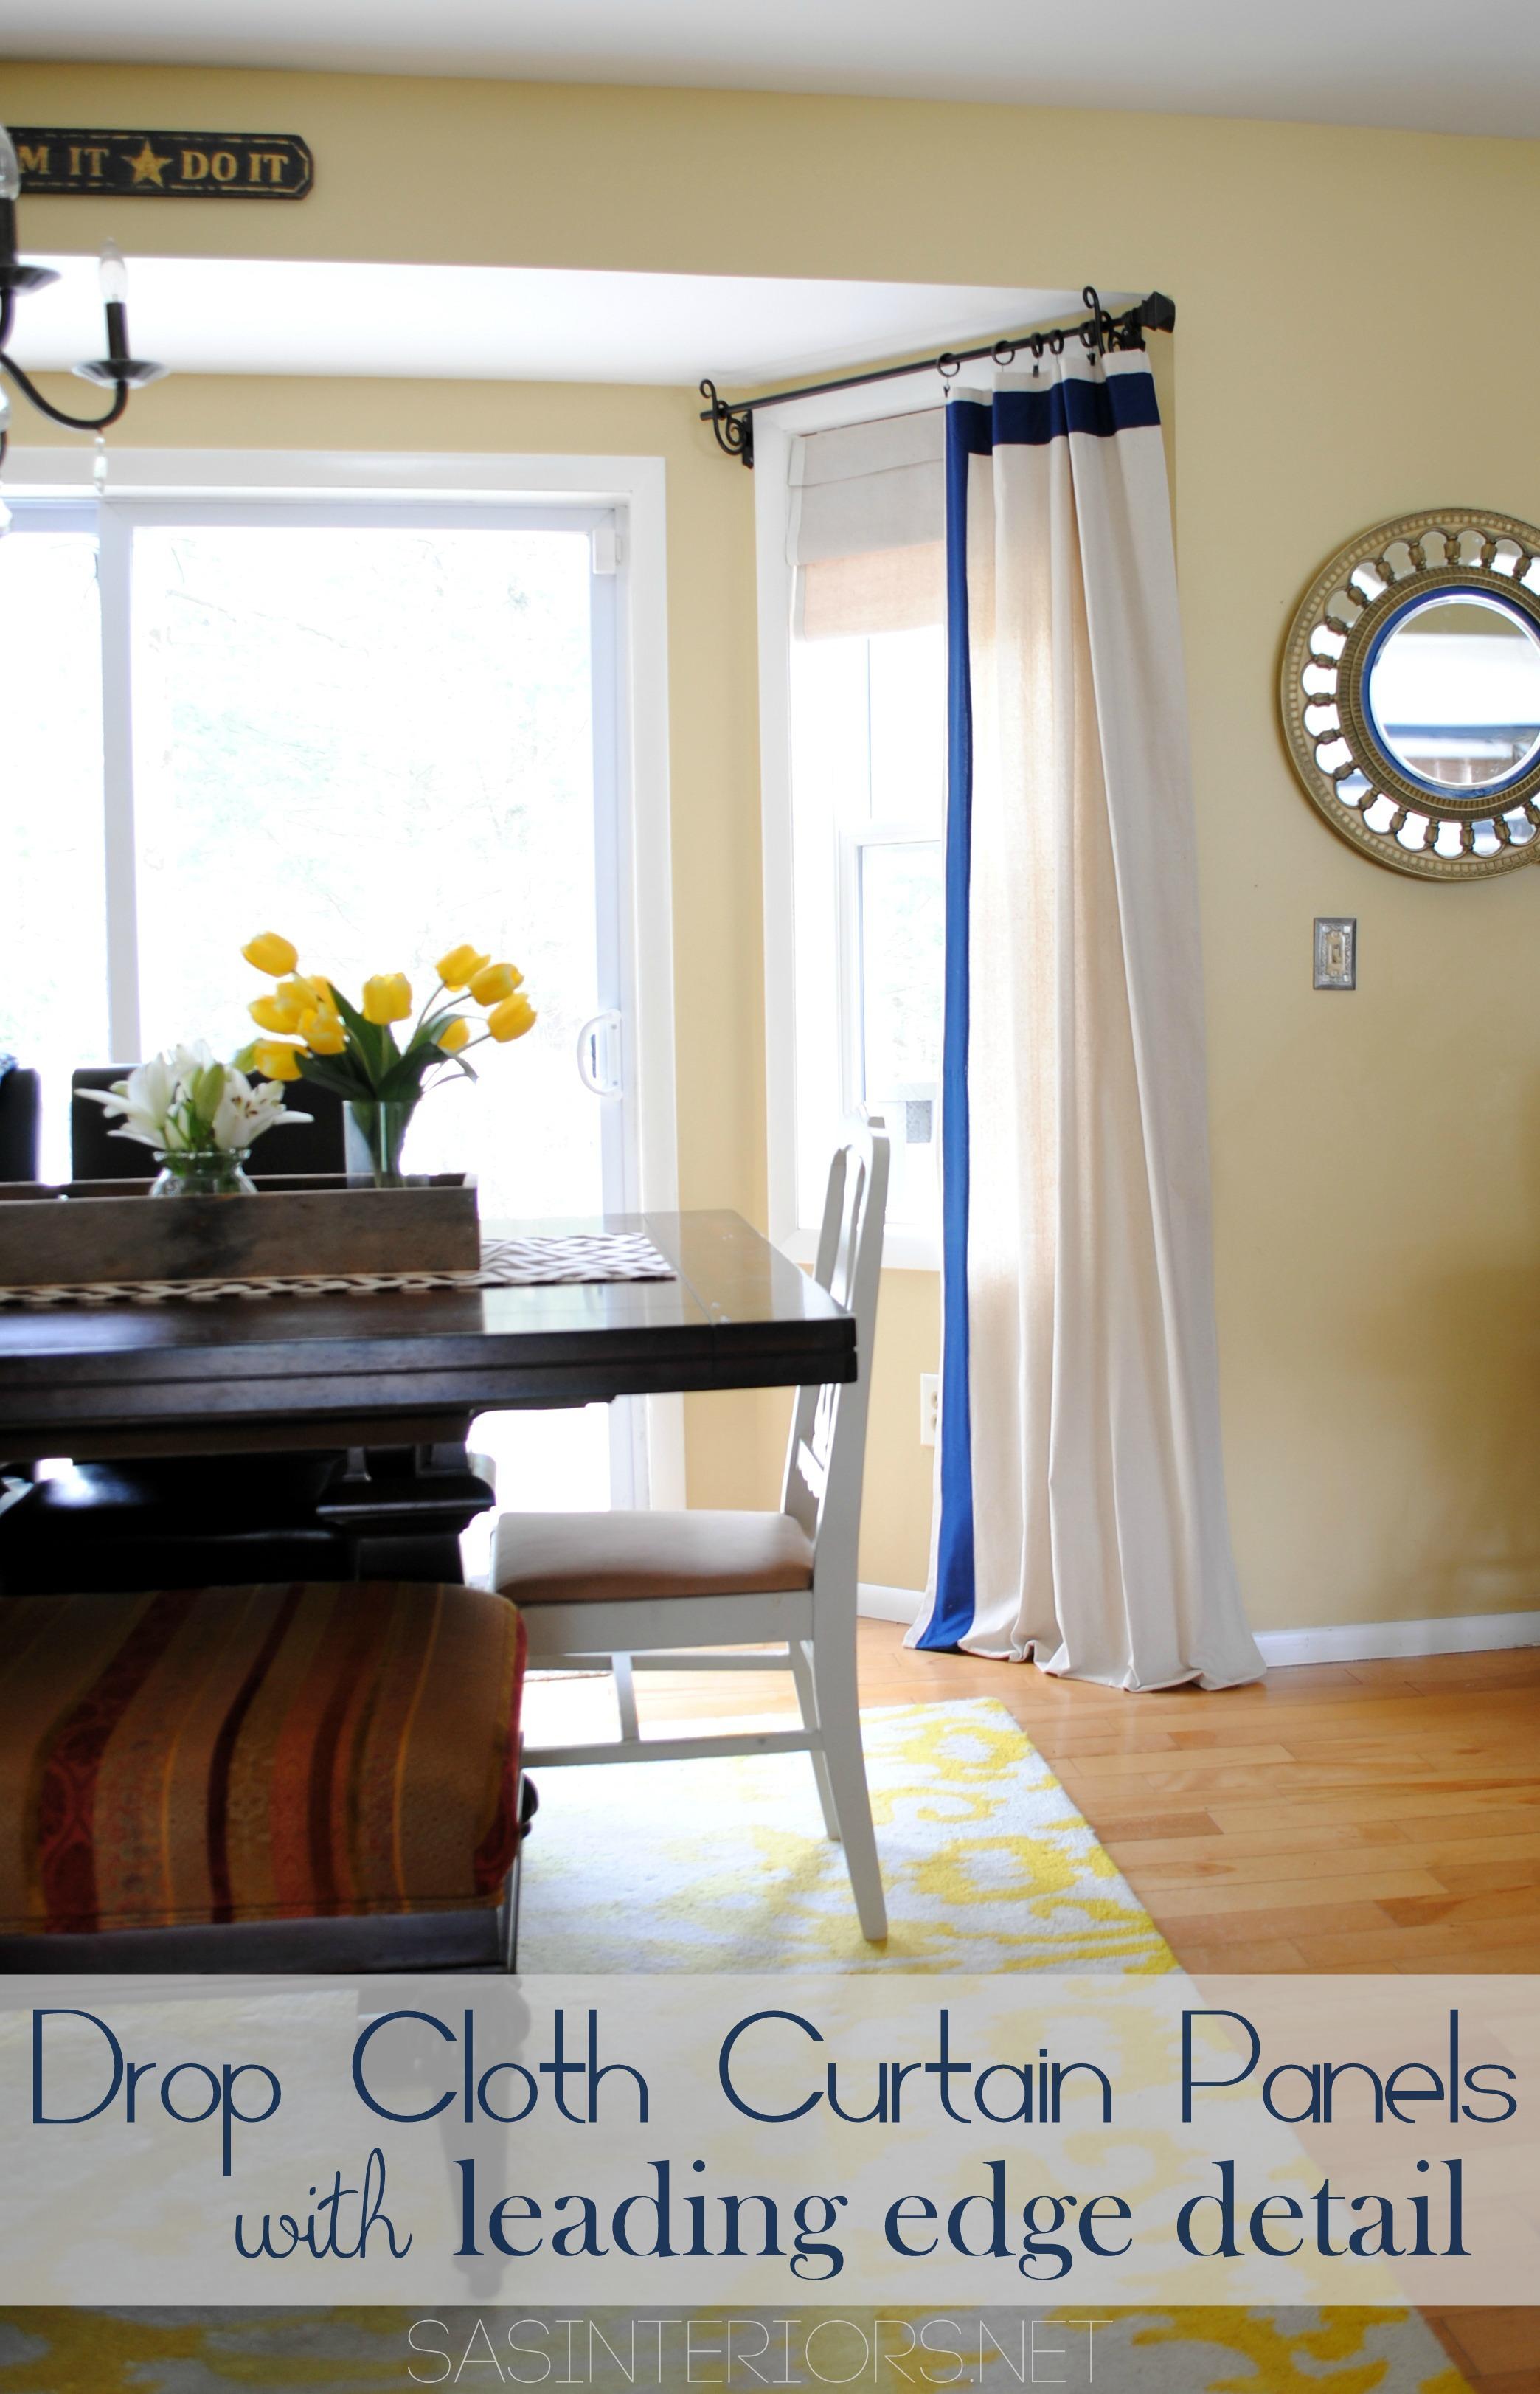 diy drop cloth curtain panels with leading edge detail jenna burger design llc